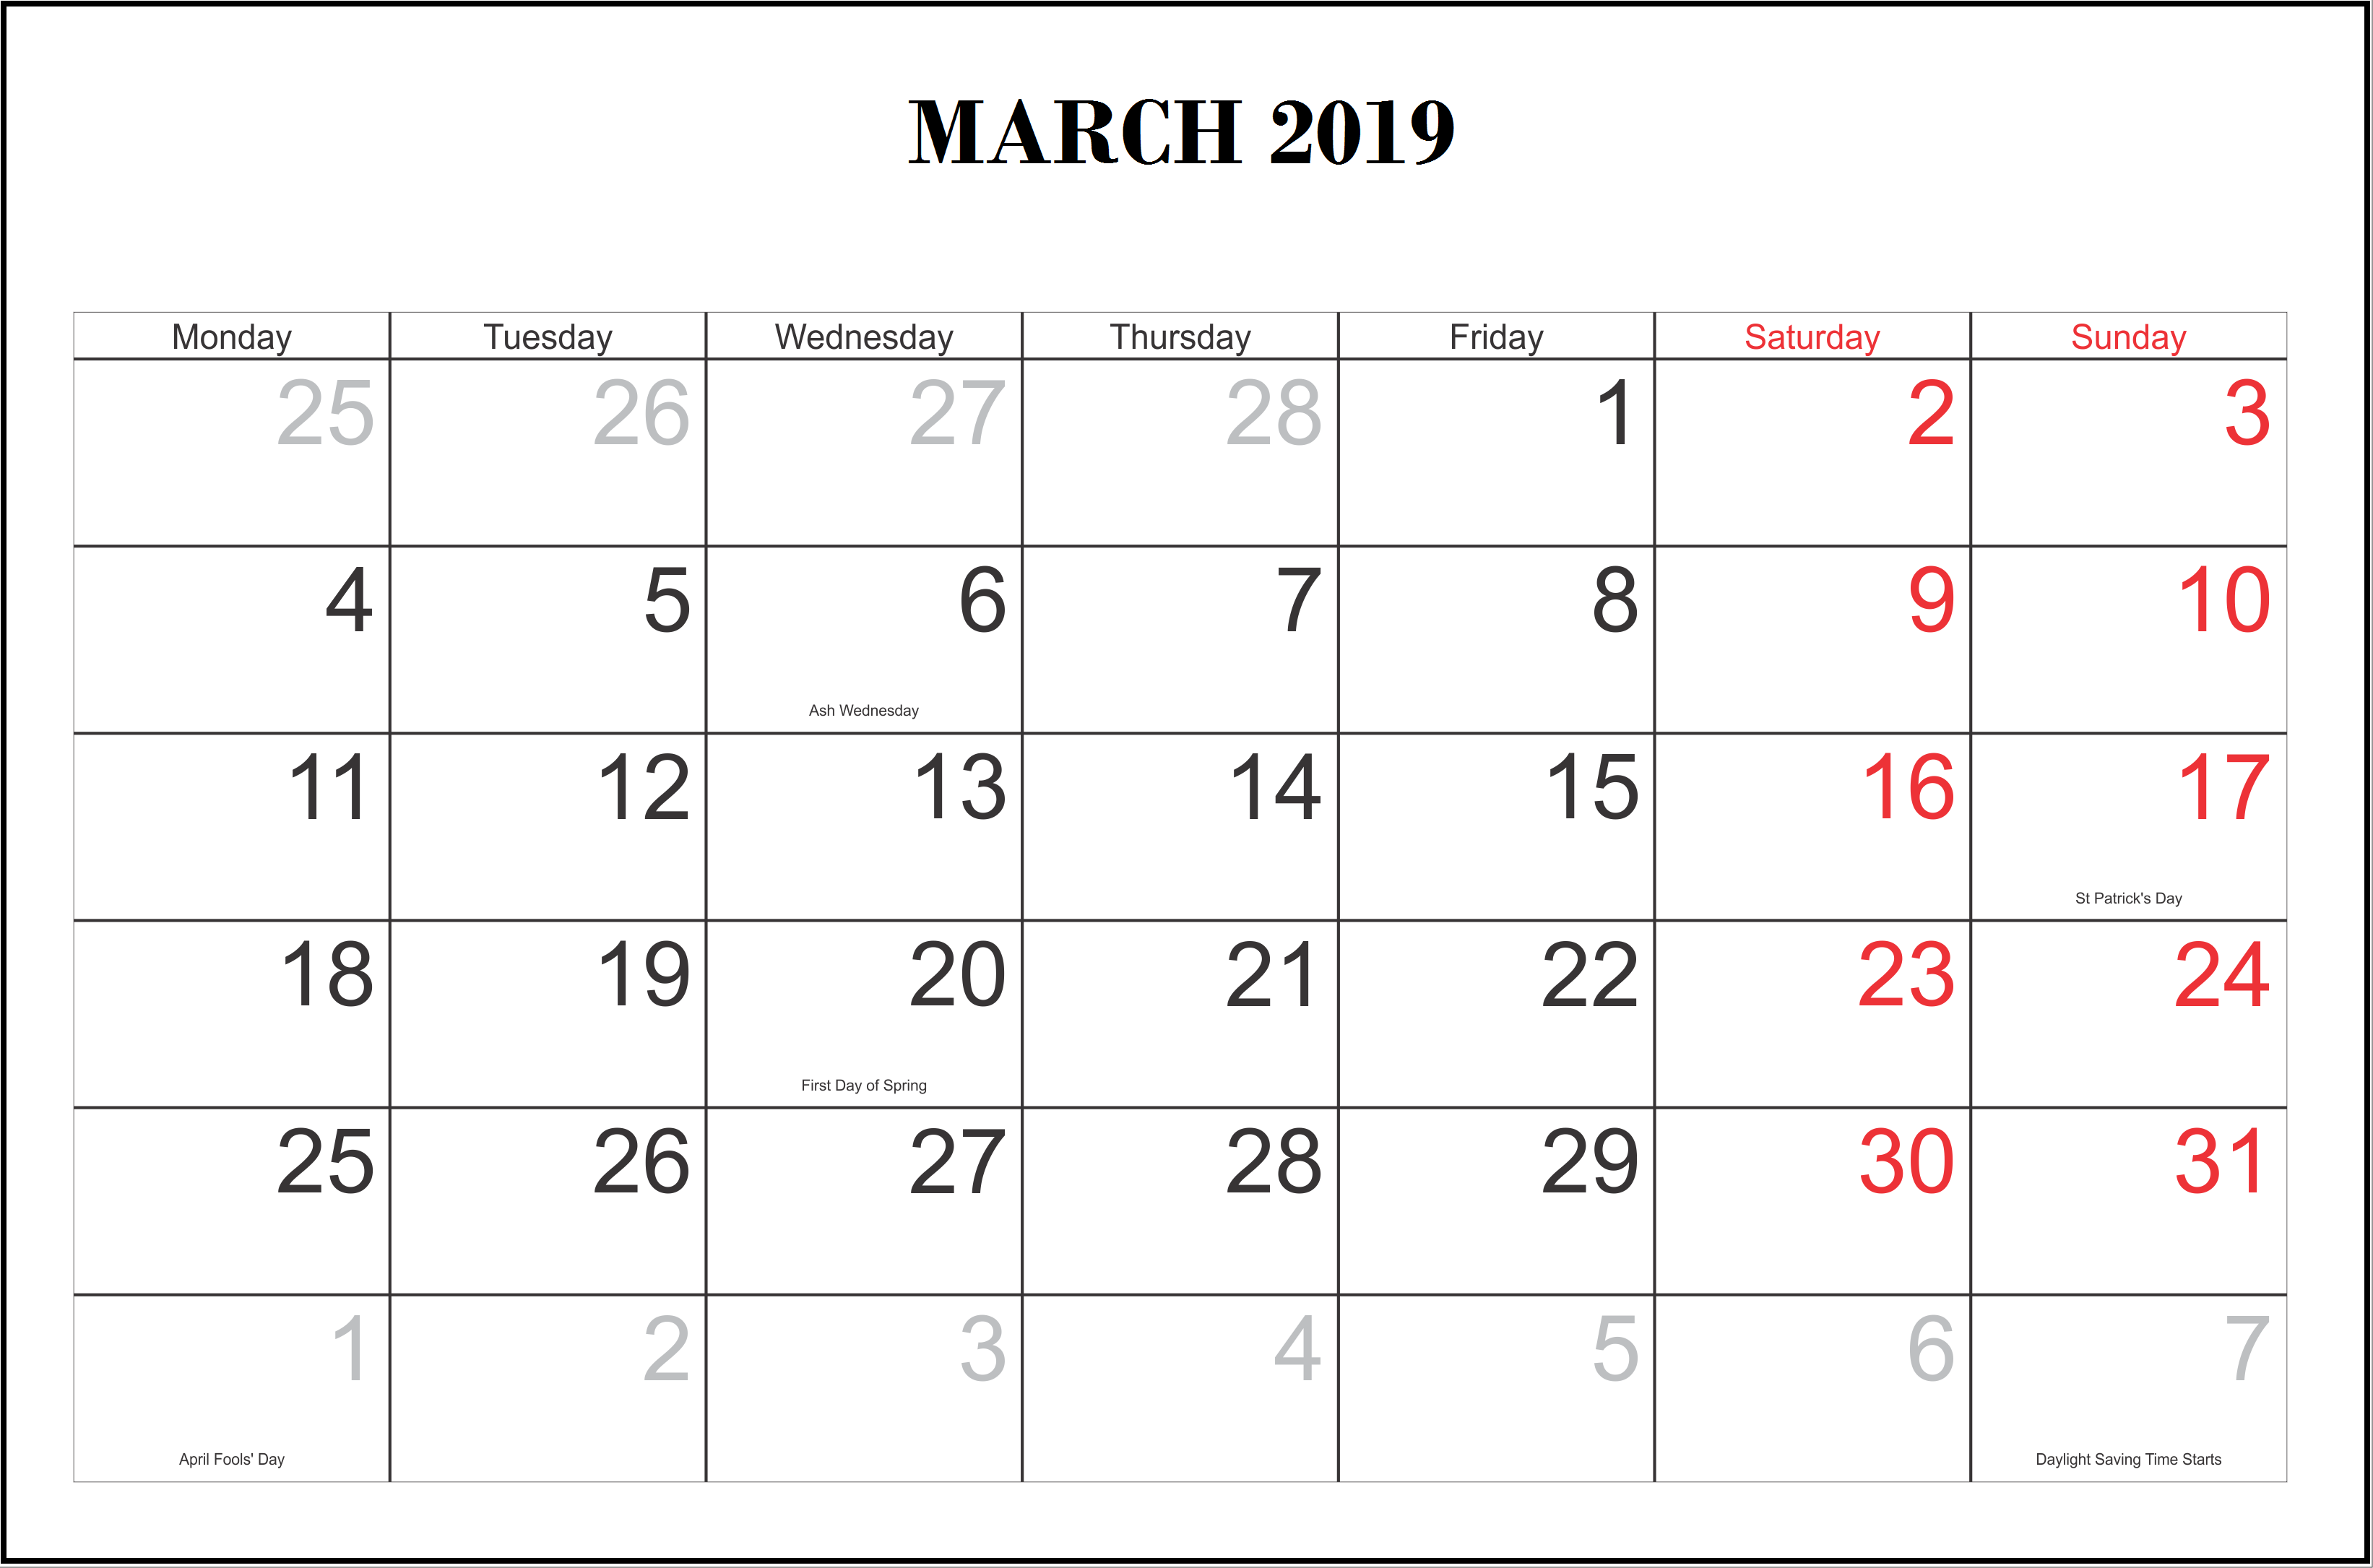 March 2019 Calendar USA With Holidays